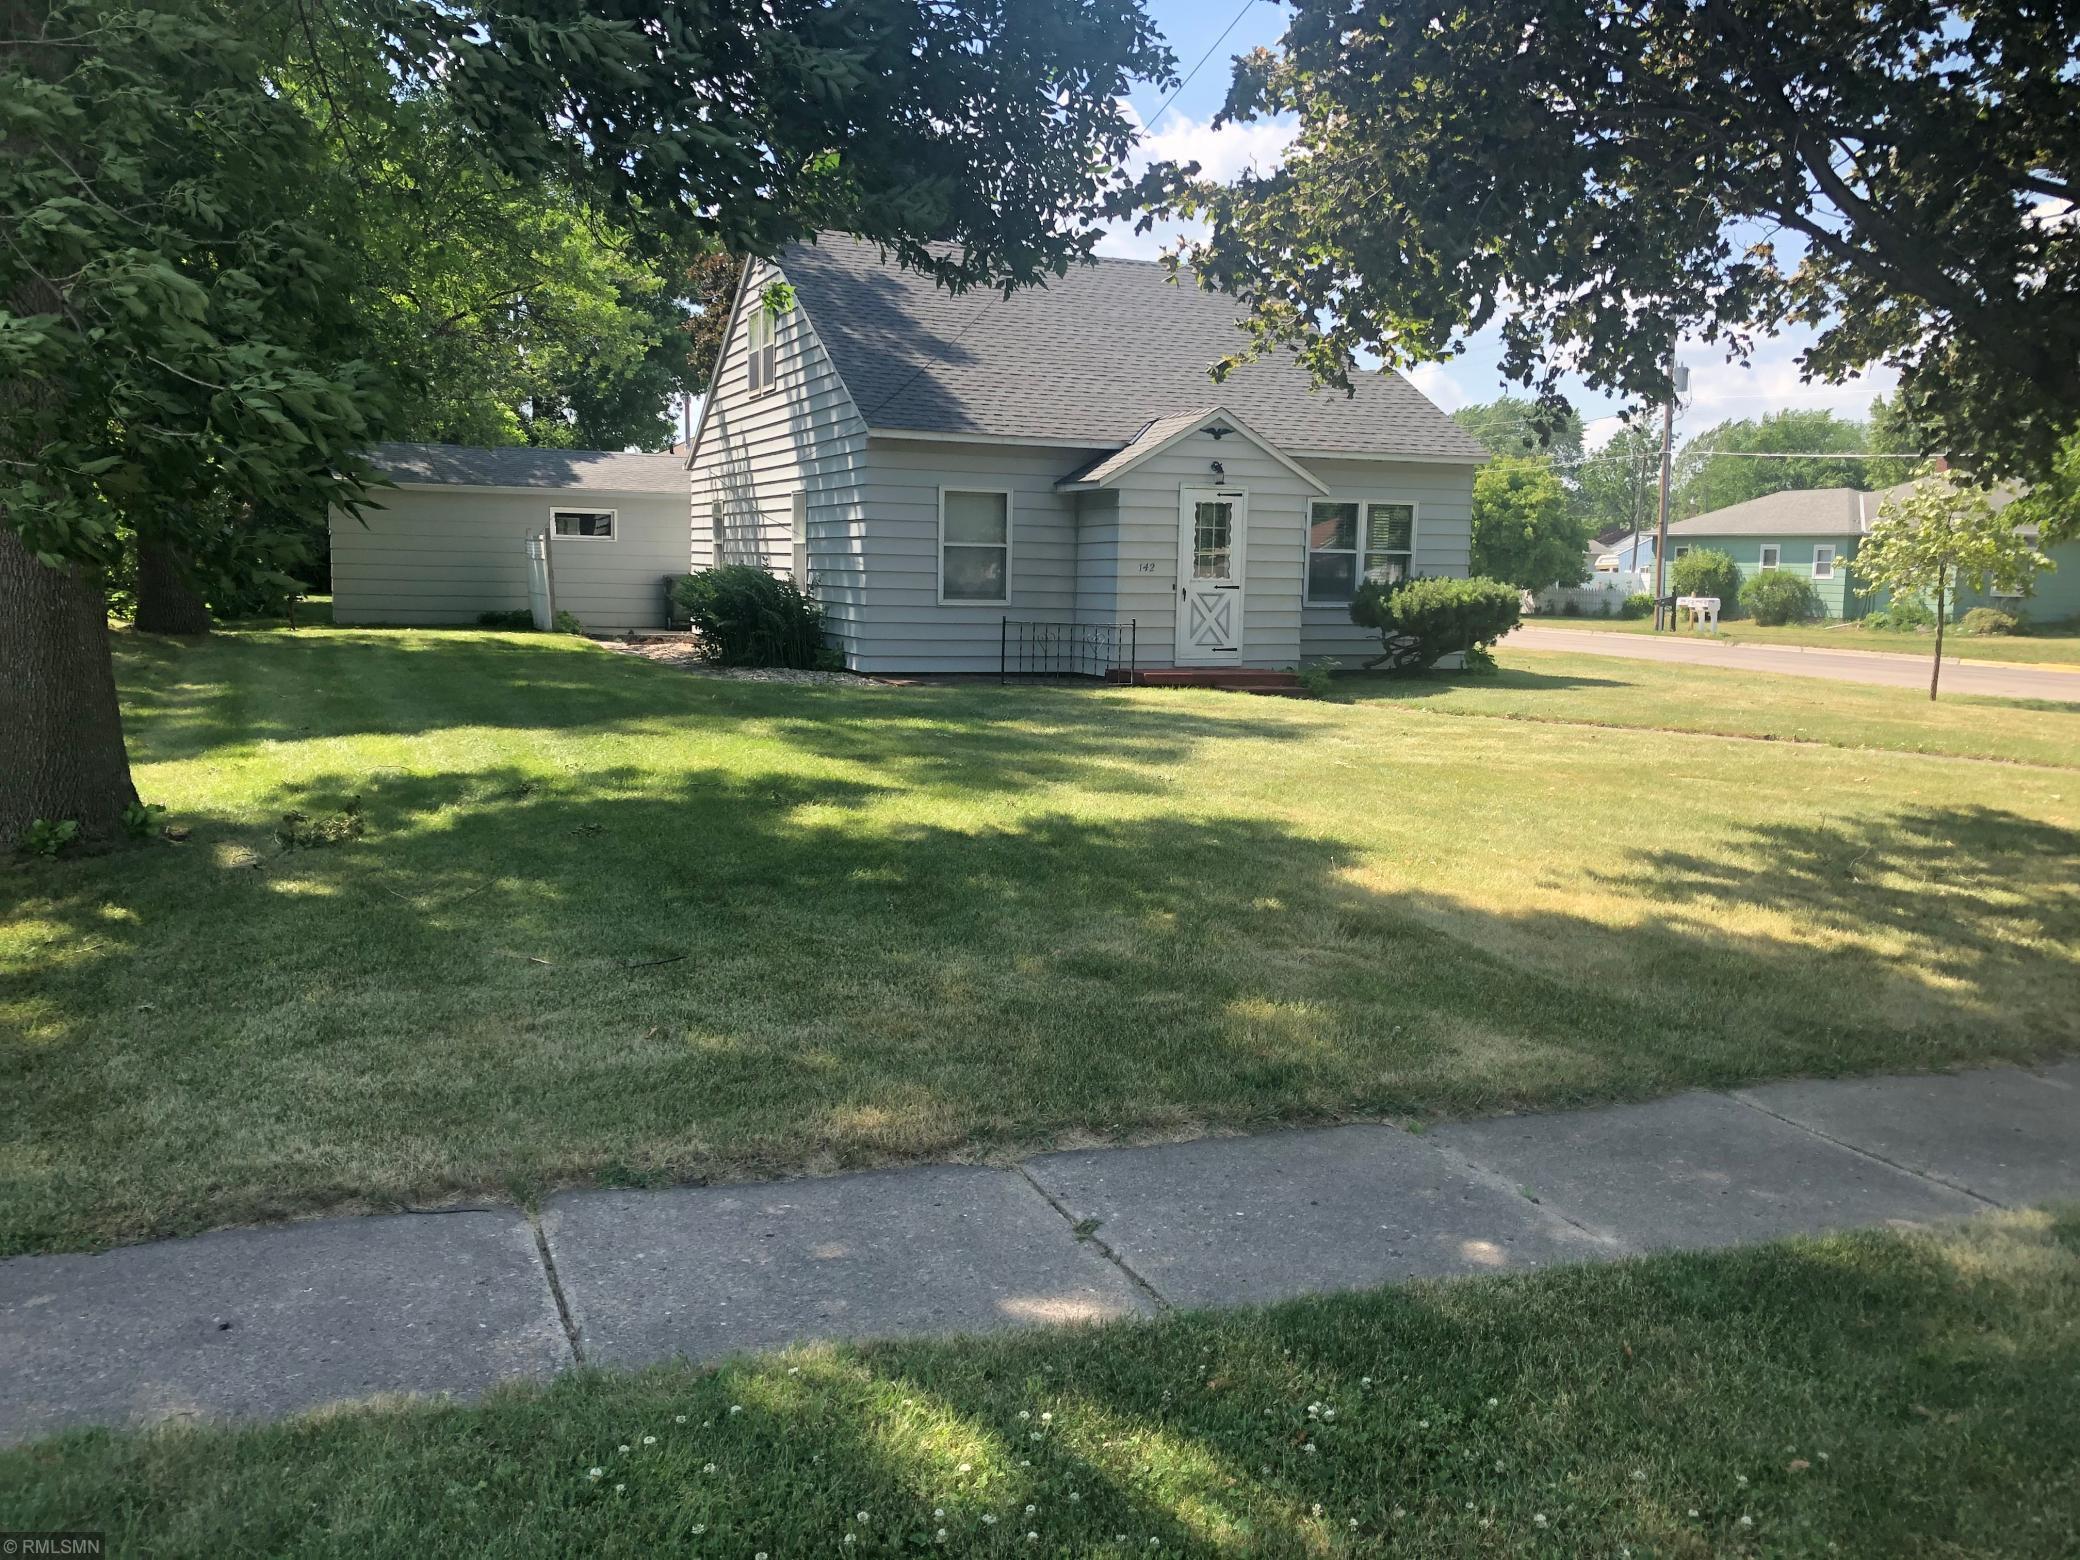 142 3rd Property Photo - Buffalo Lake, MN real estate listing